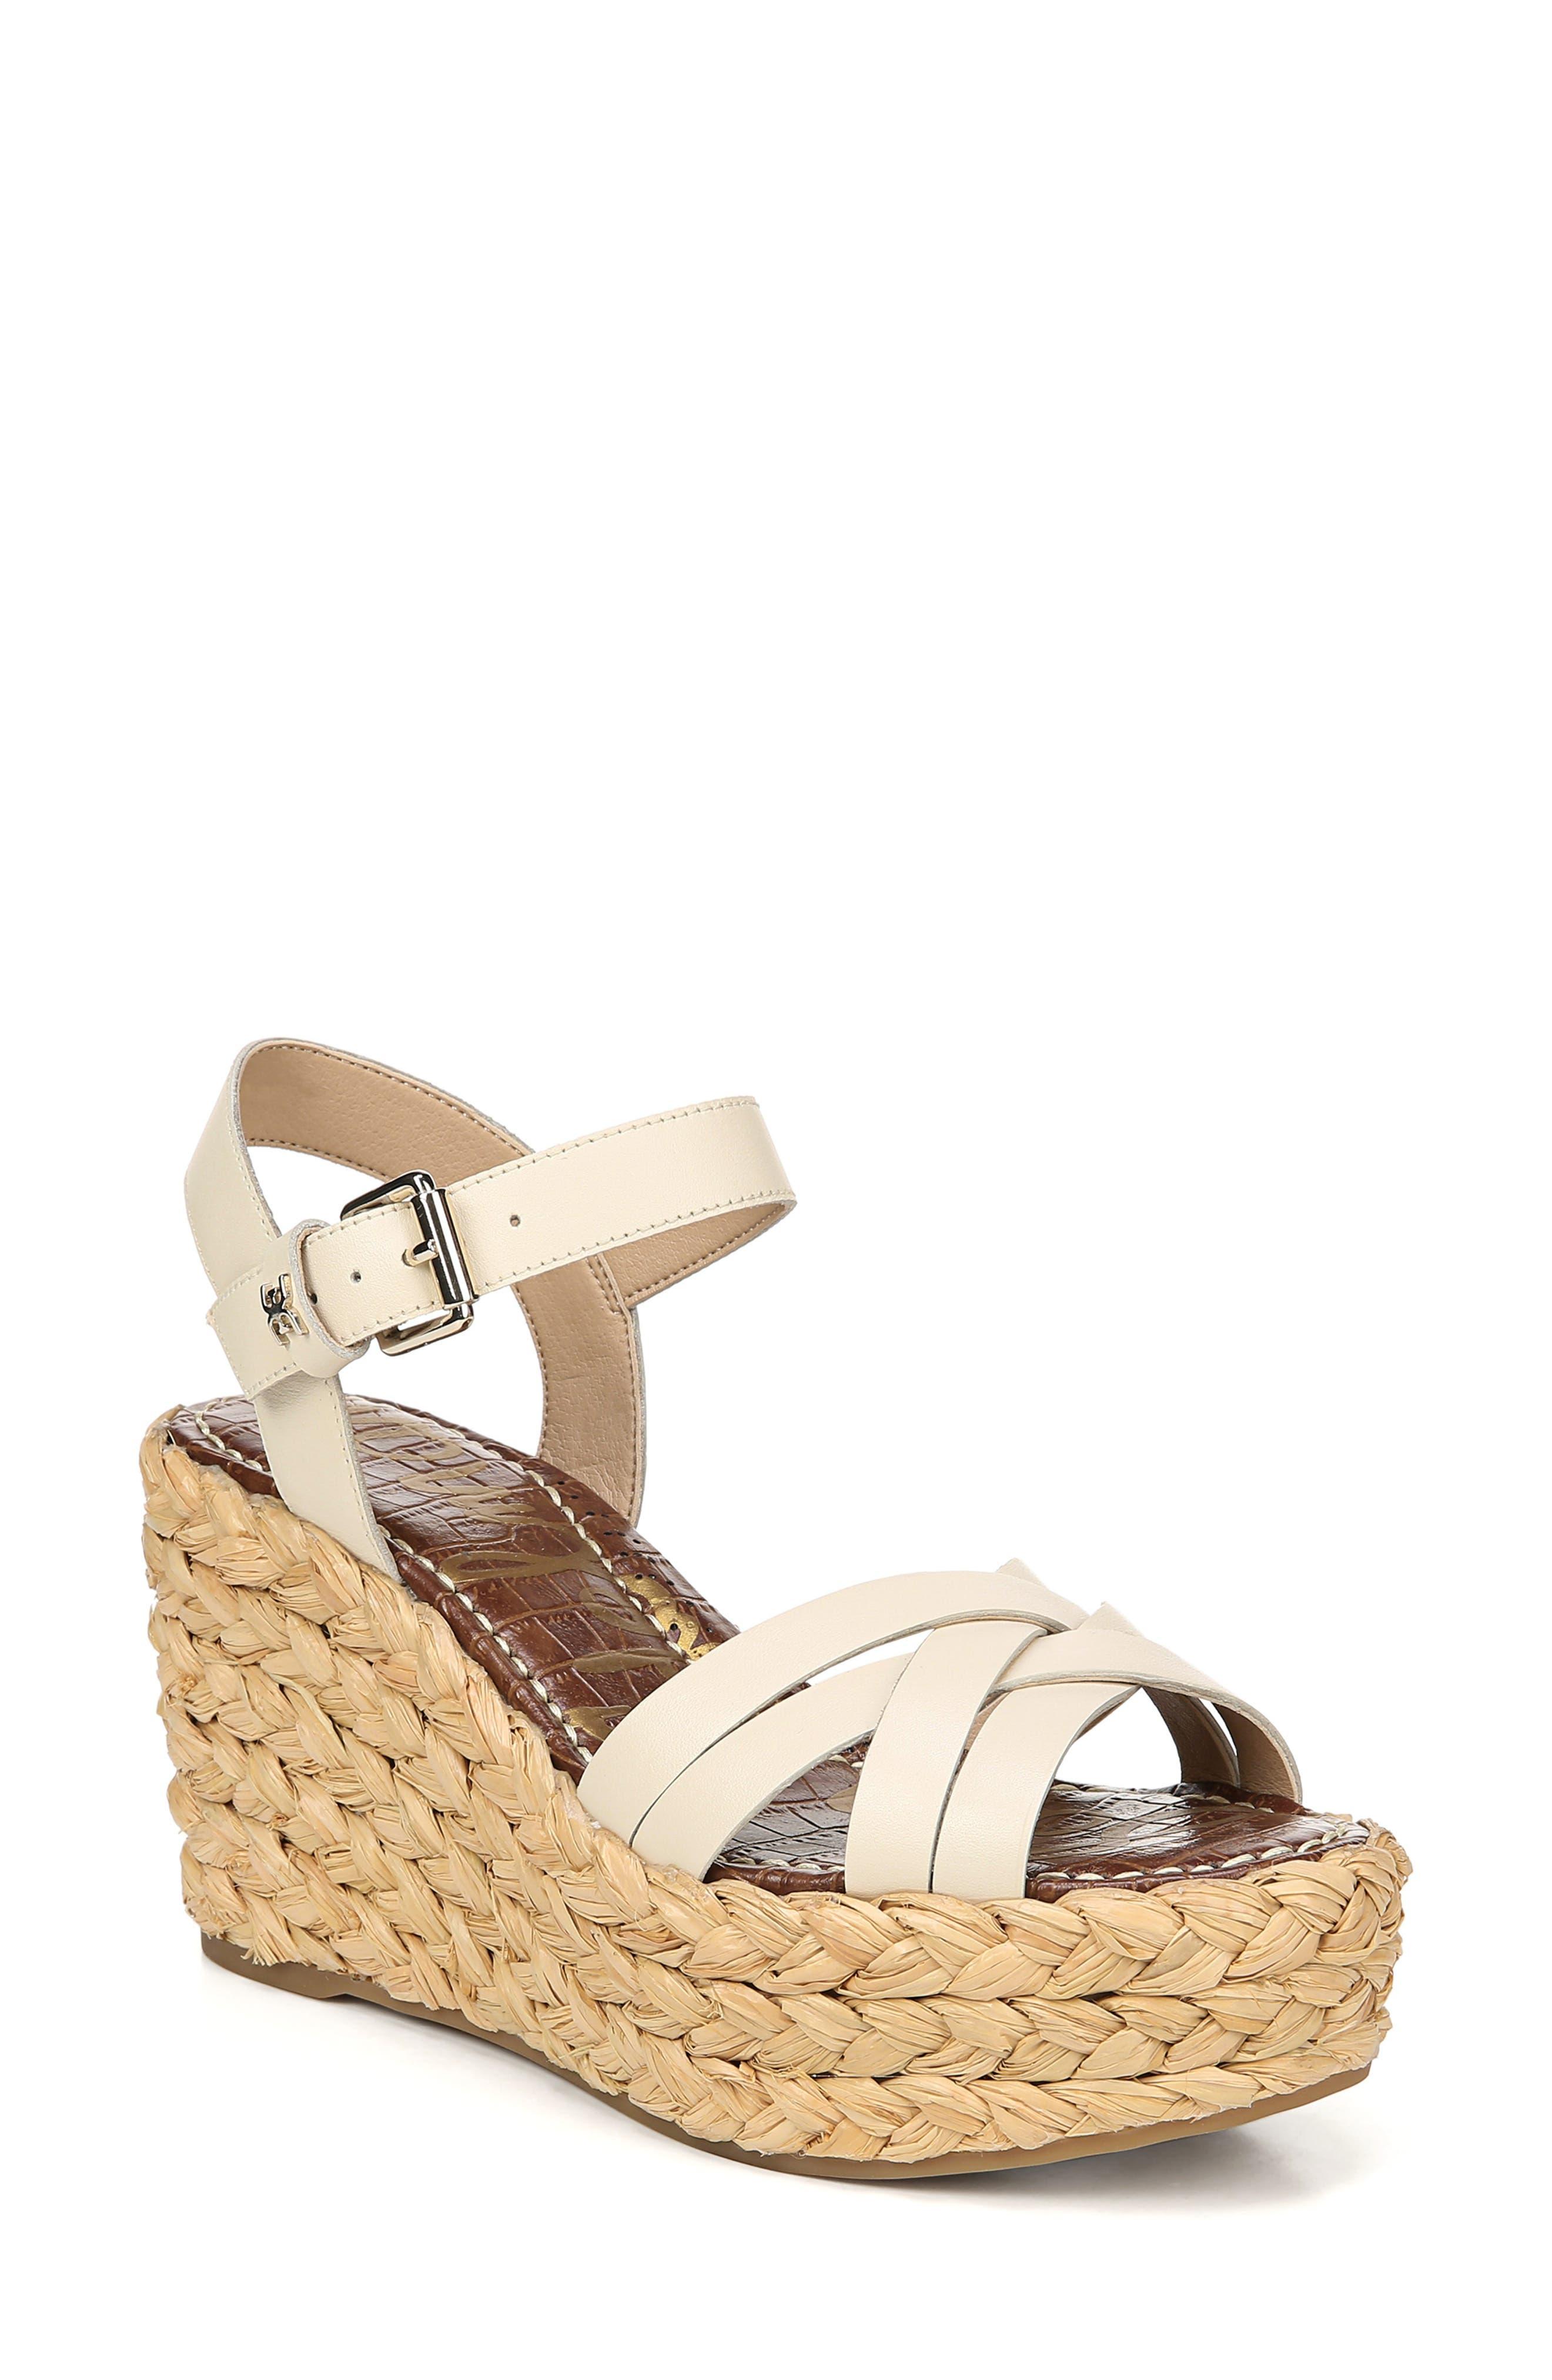 Sam Edelman Darline Platform Wedge Sandal, White